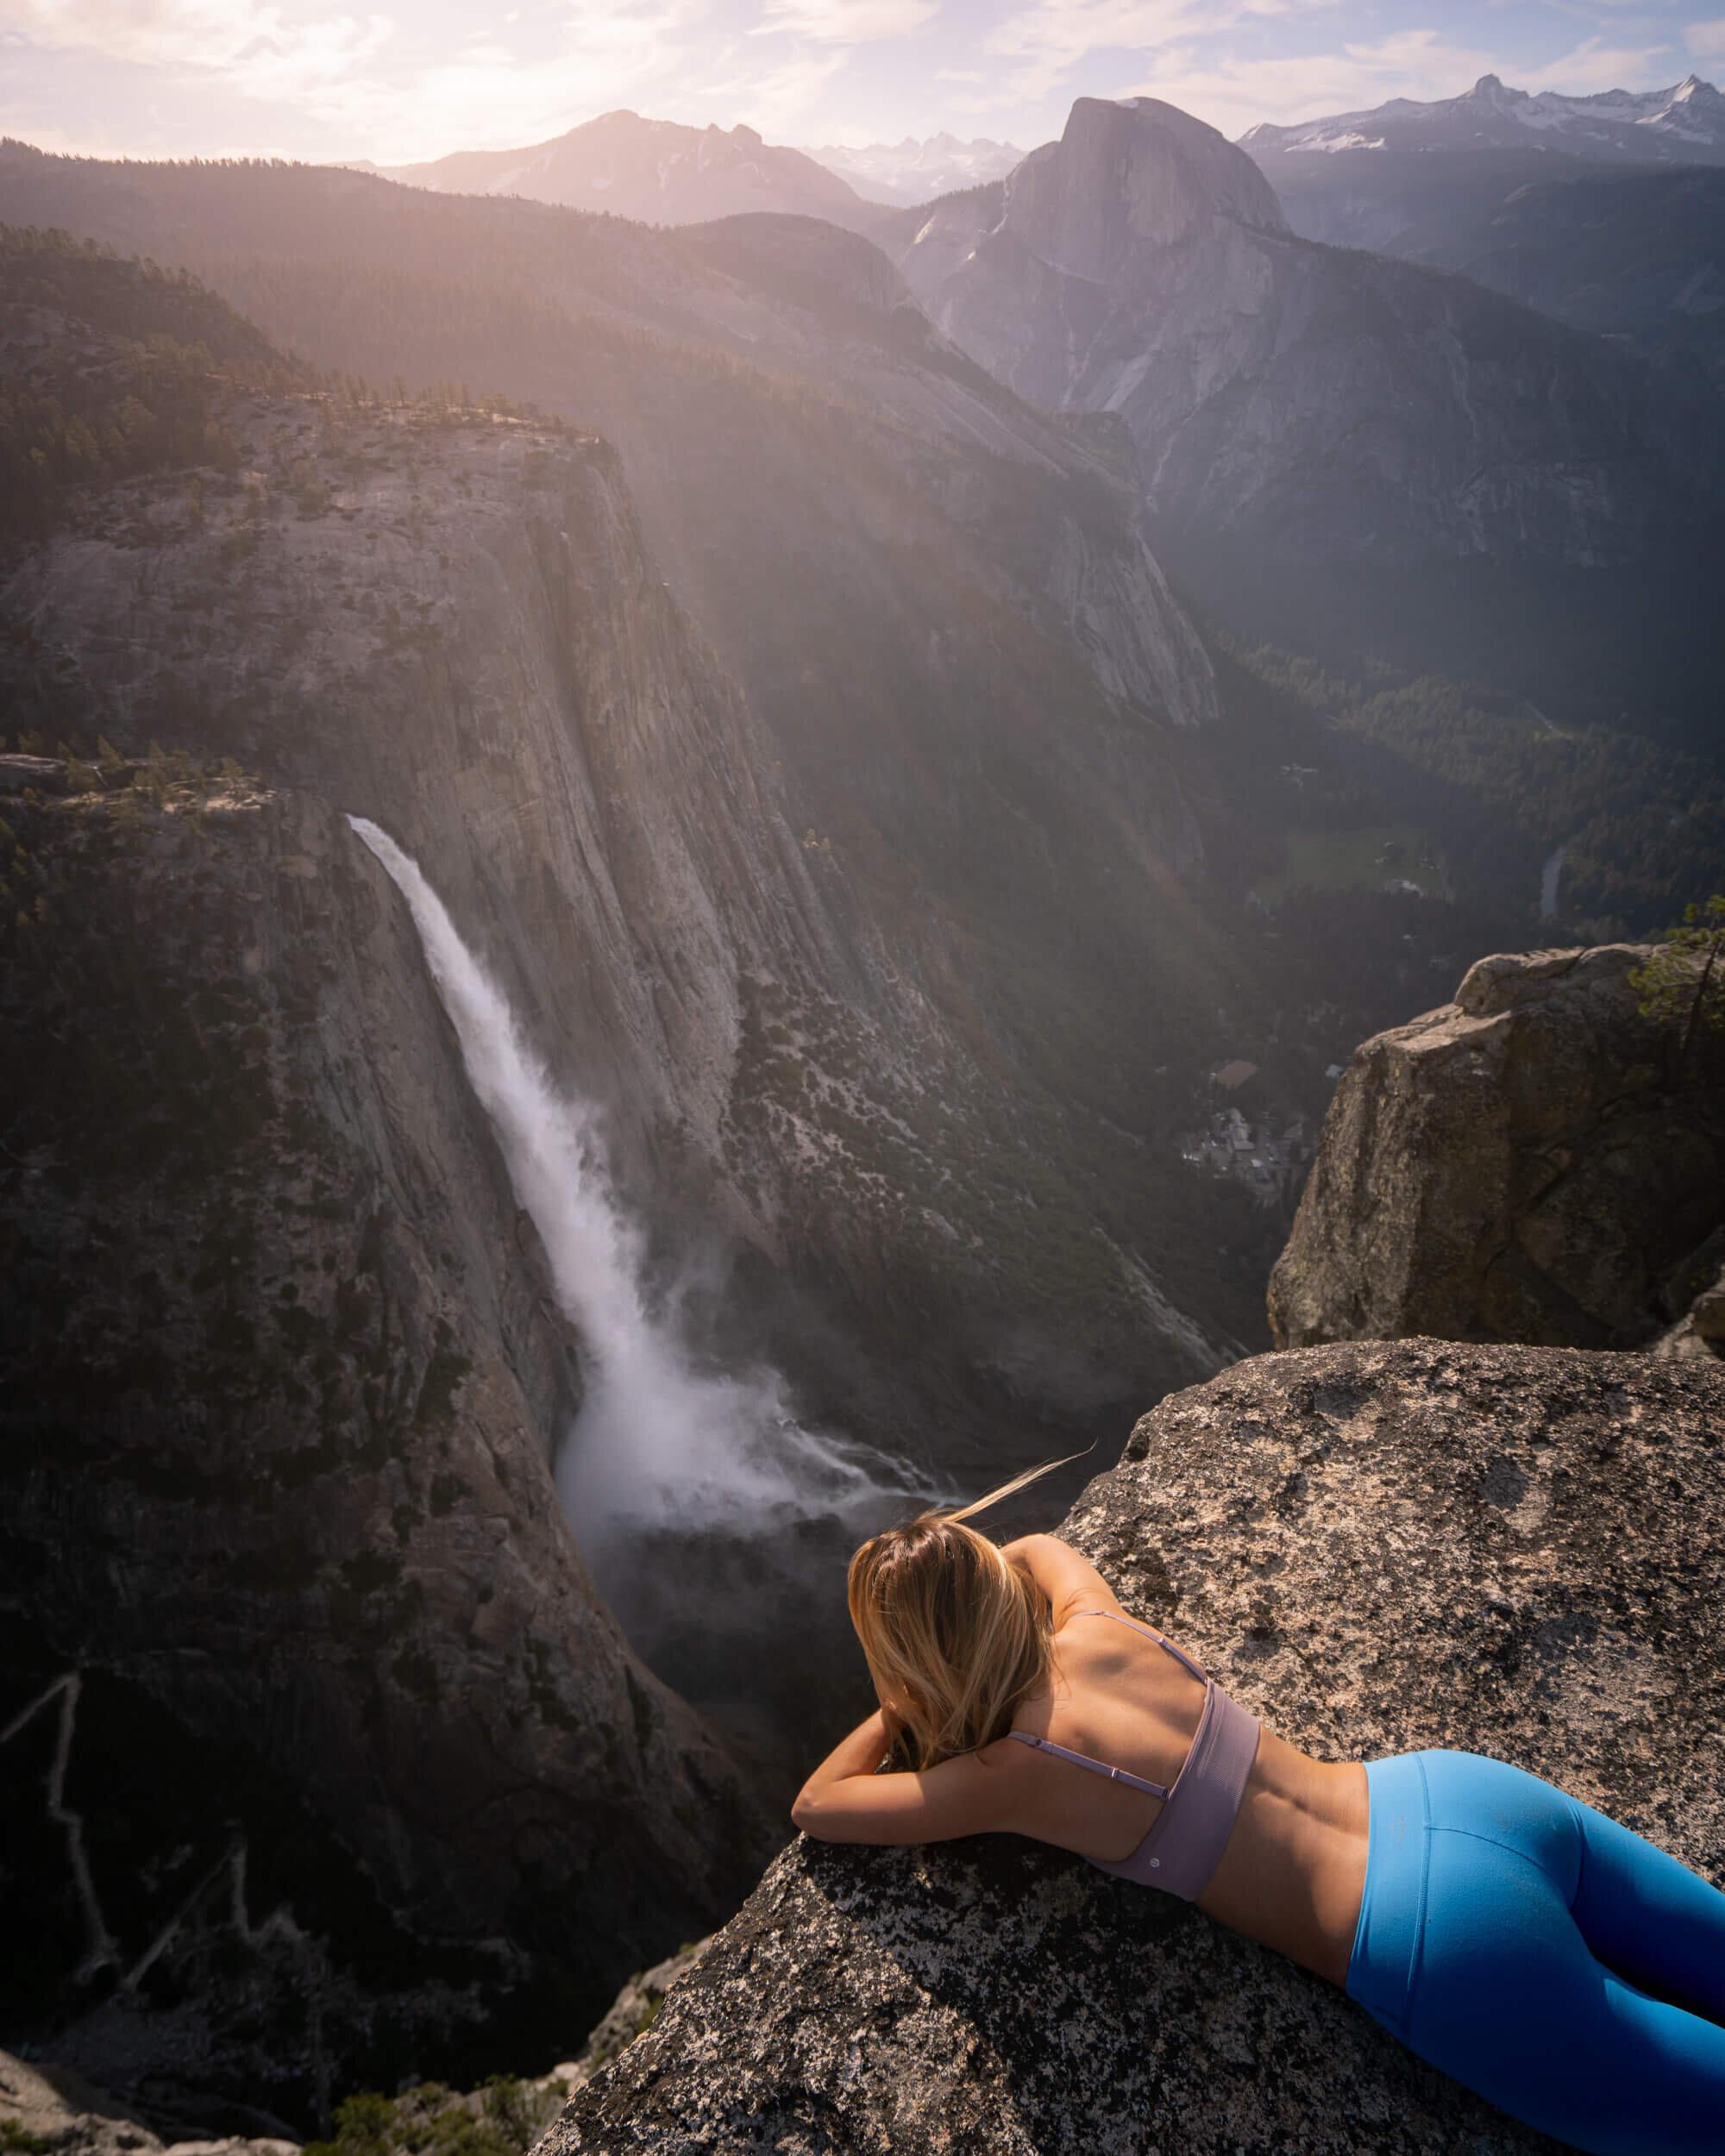 Looking down on Yosemite Falls.